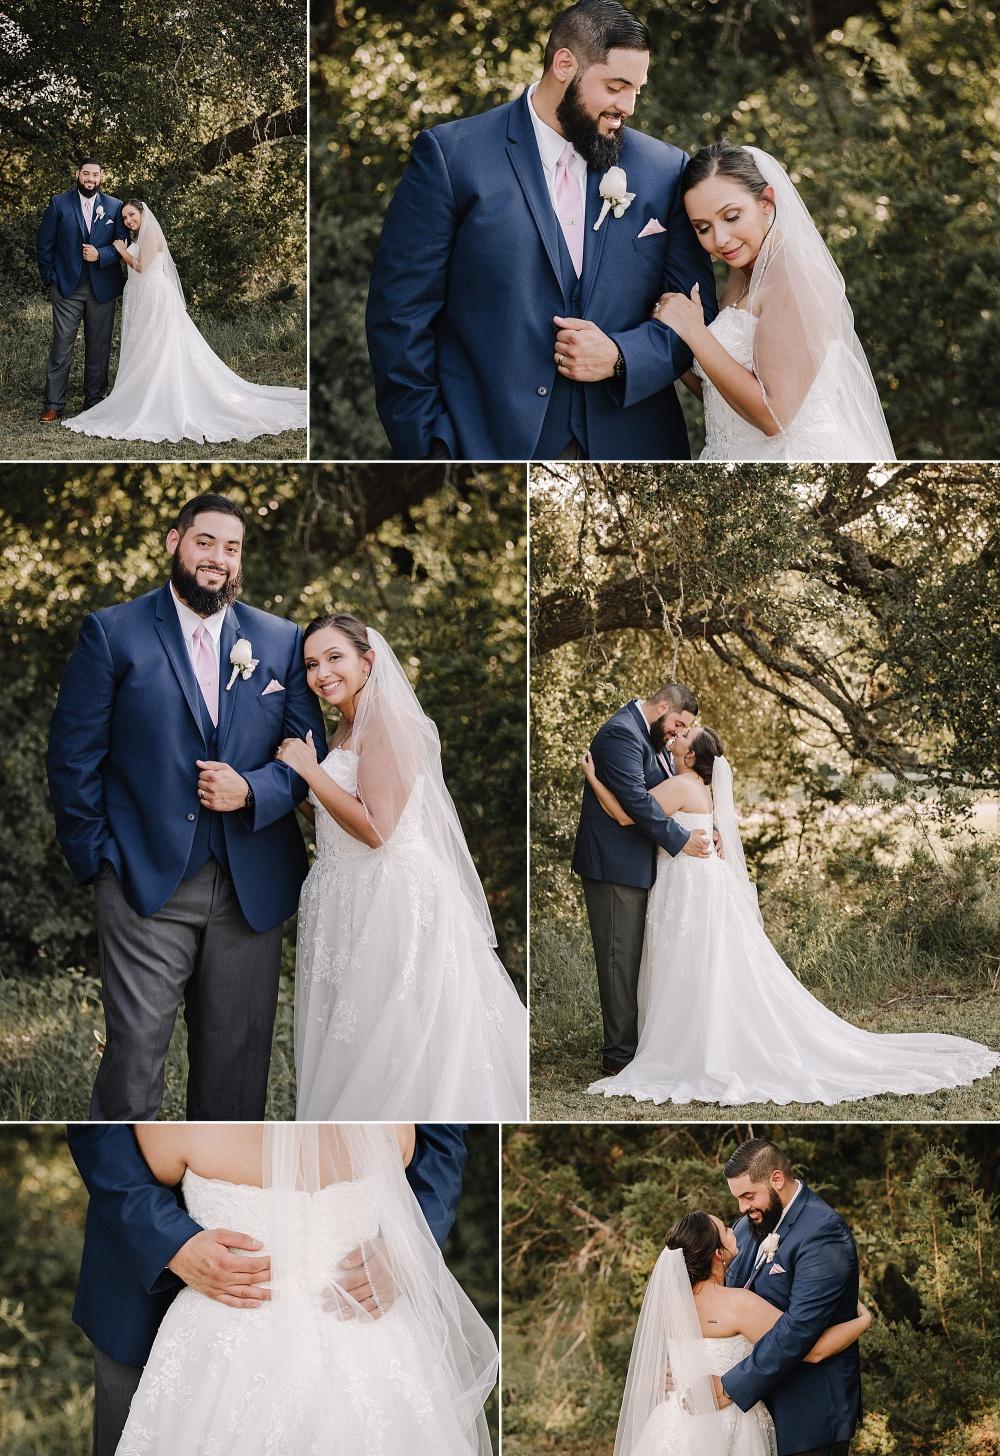 Wedding-Photographer-Bulverde-Texas-Western-Sky-Event-Venue-Carly-Barton-Photography_0056.jpg